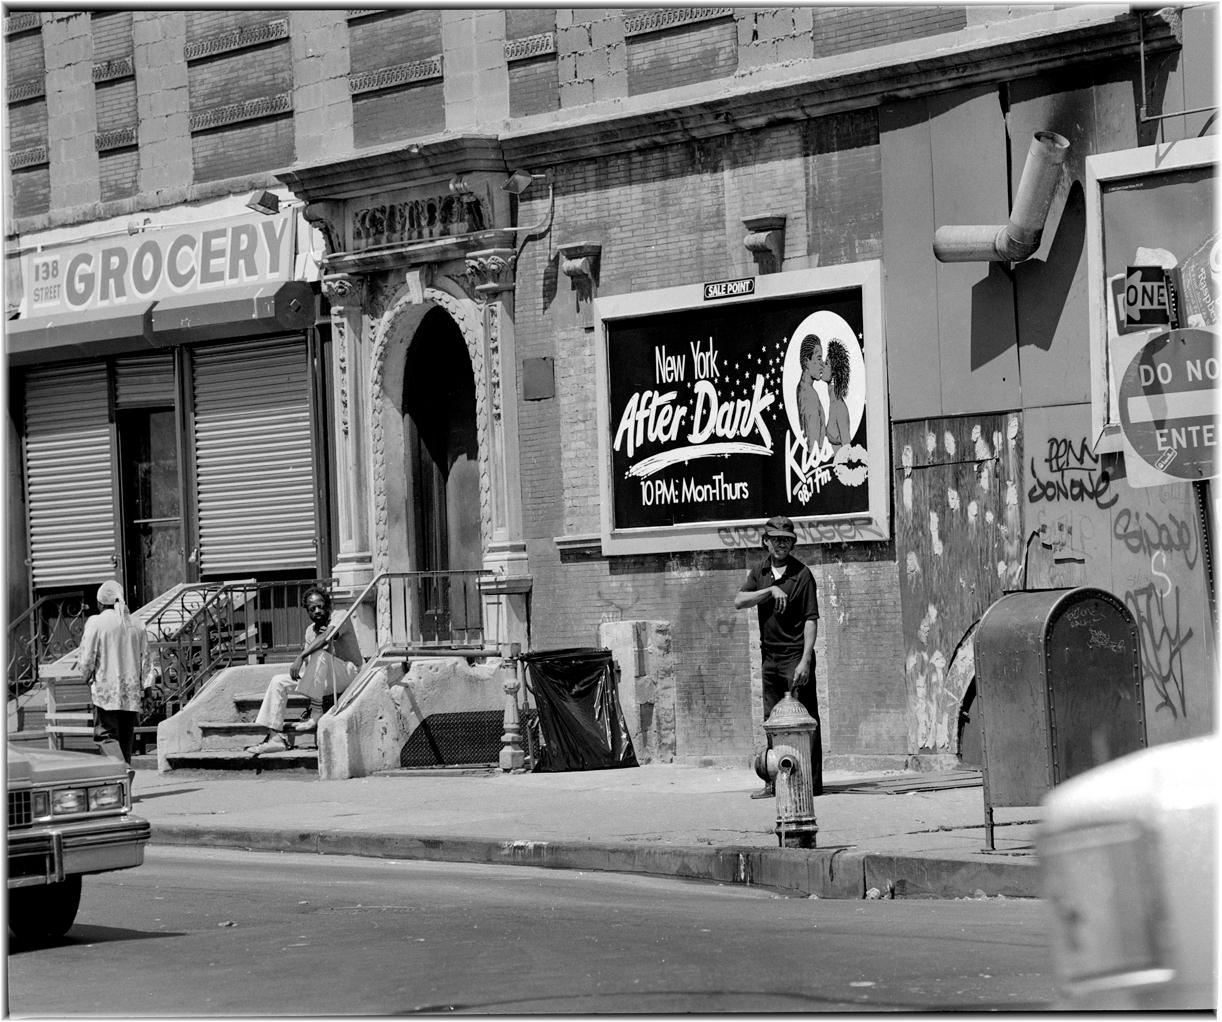 New York After Dark Harlem 1986 Black And White Street